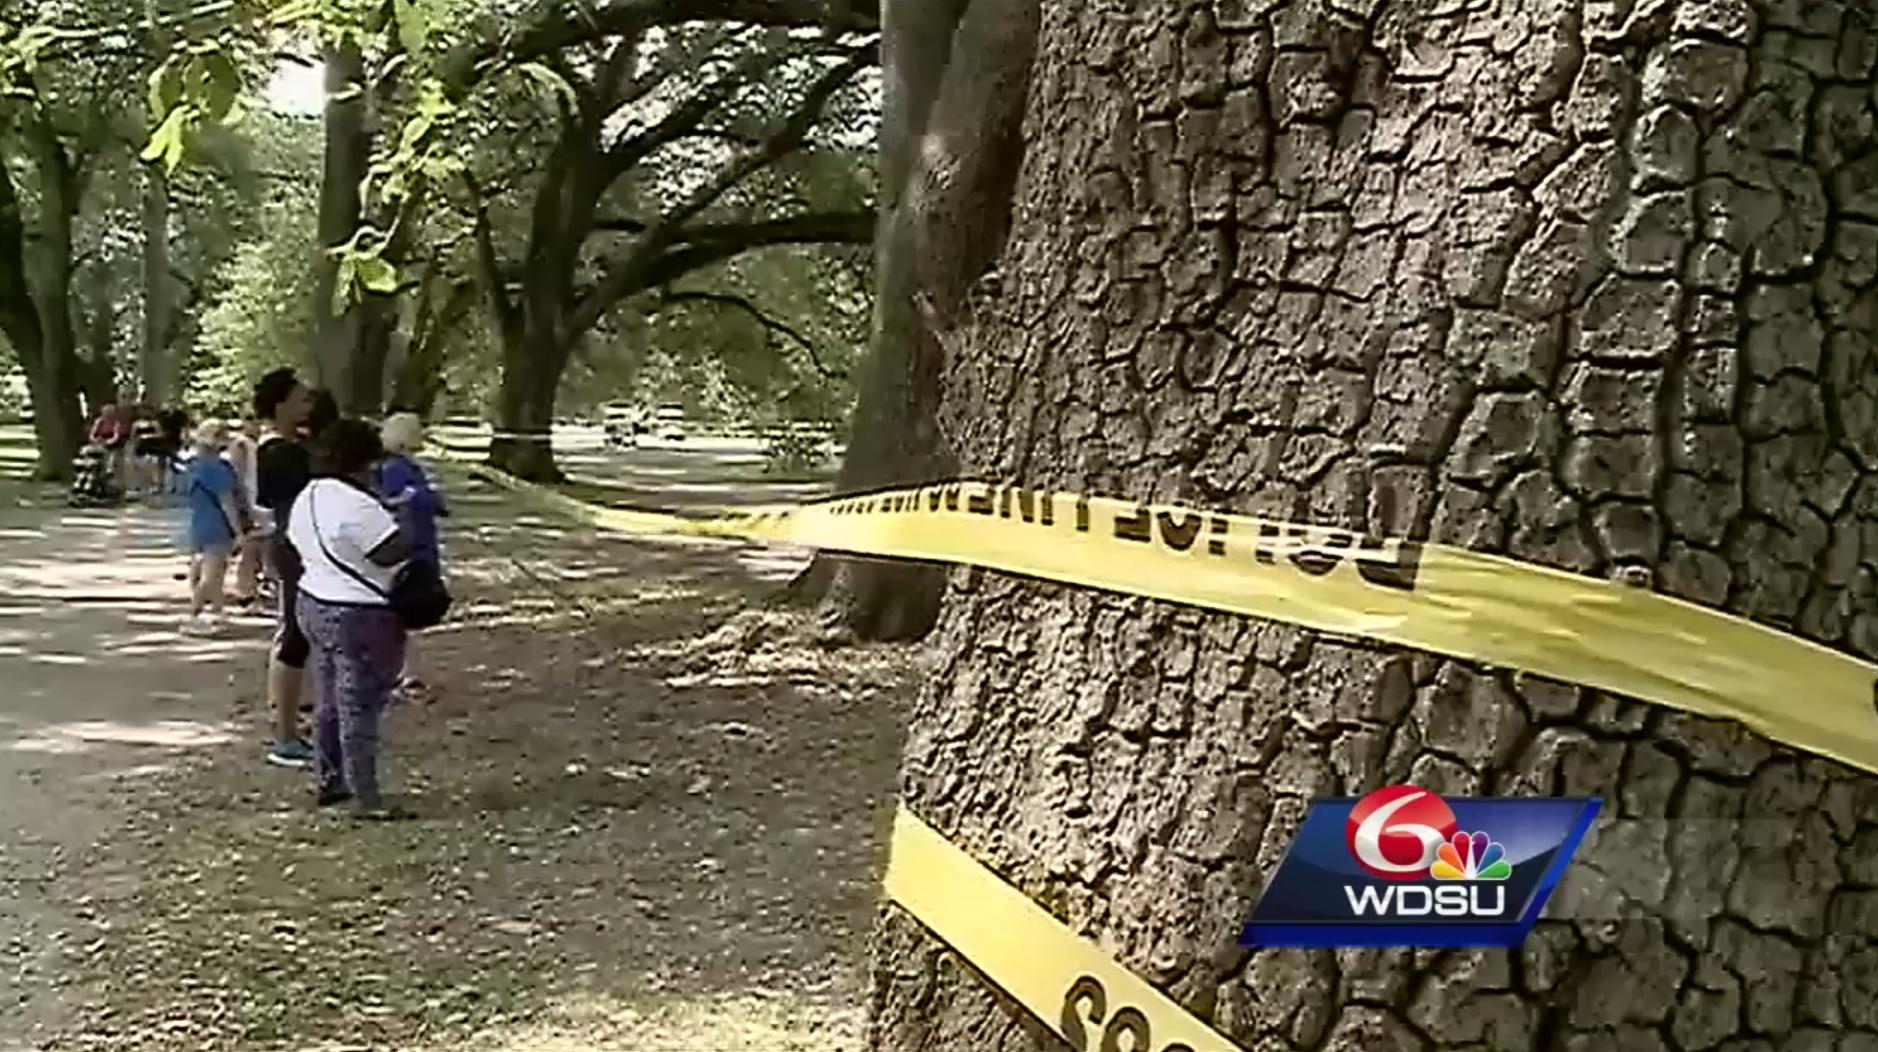 Coroner's Office identifies body found at Audubon Park